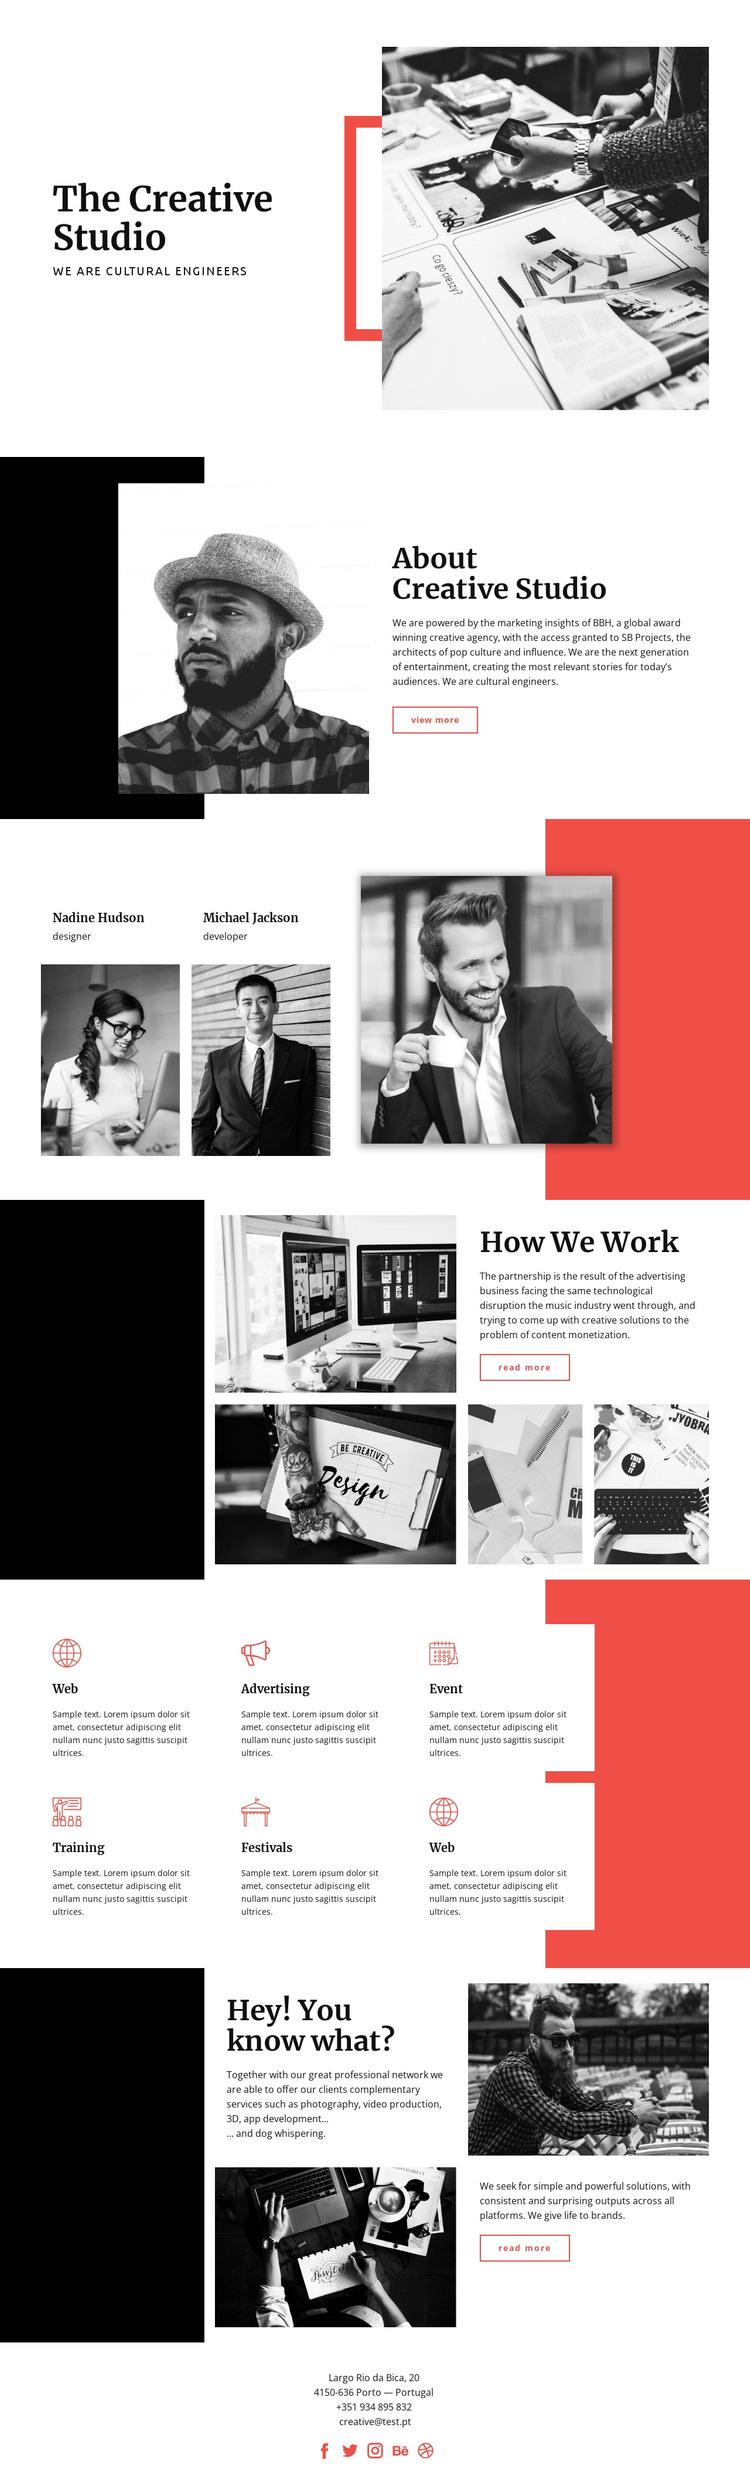 The Creative Studio Web Design